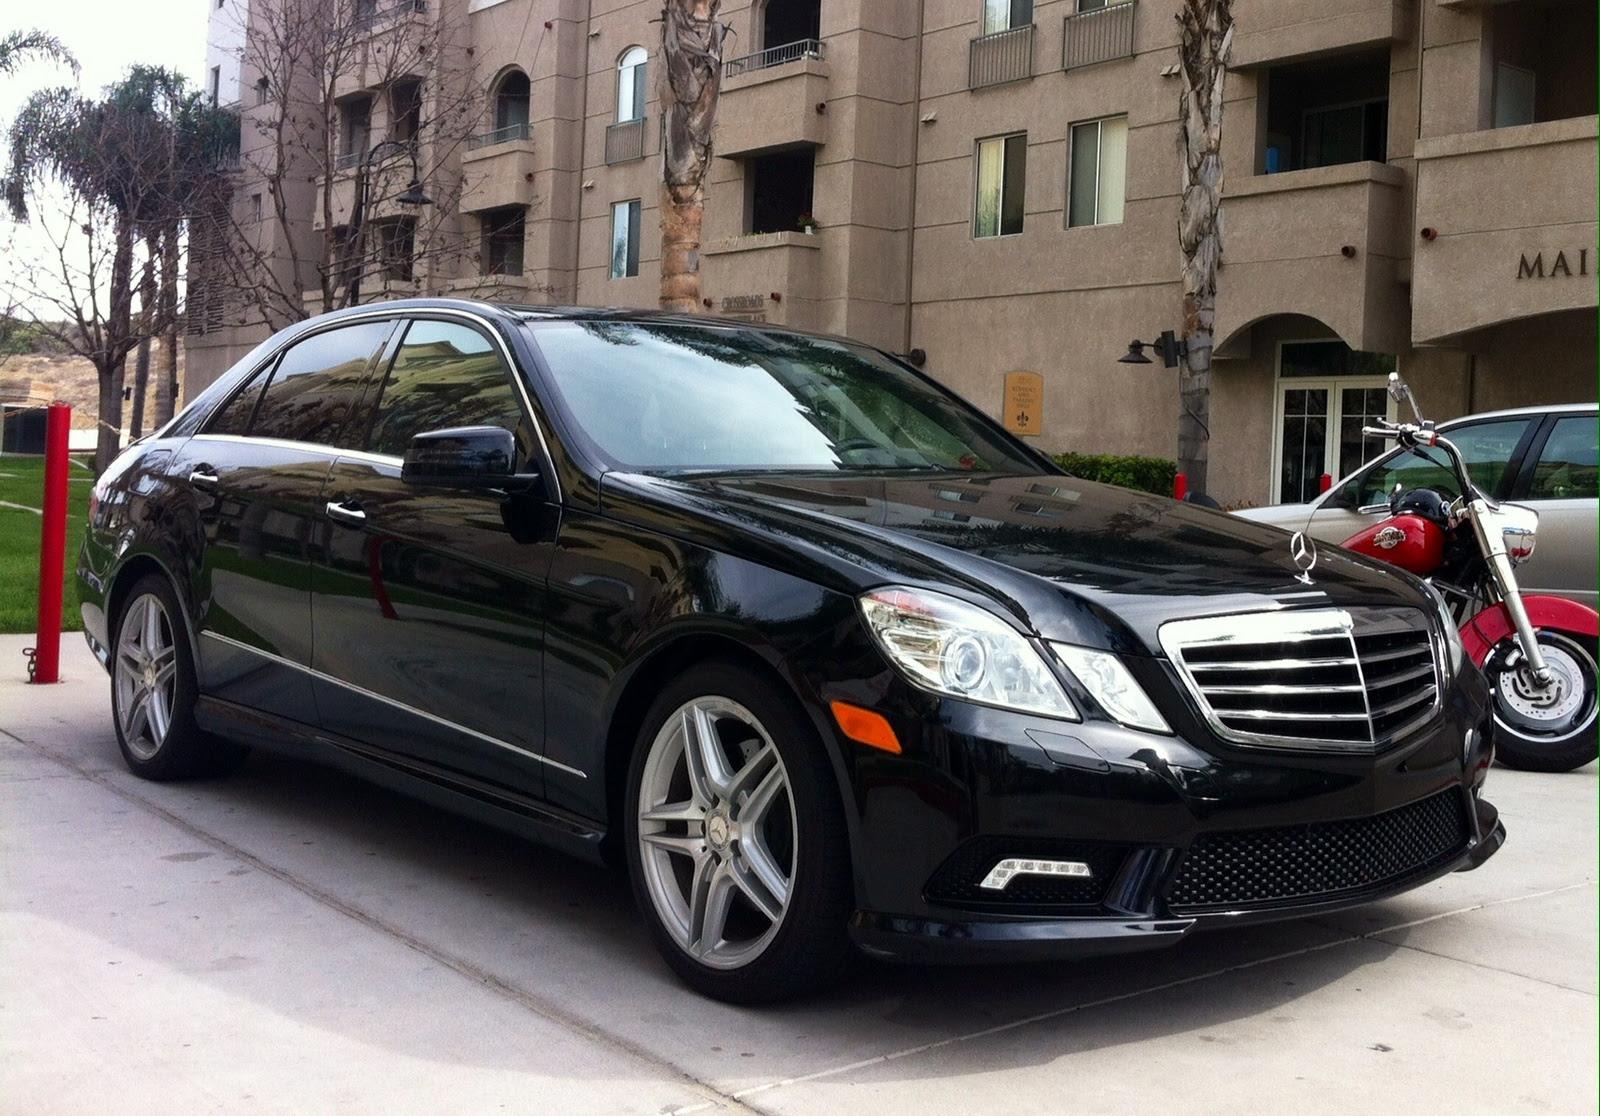 2011 Mercedes-Benz E-Class - Pictures - CarGurus